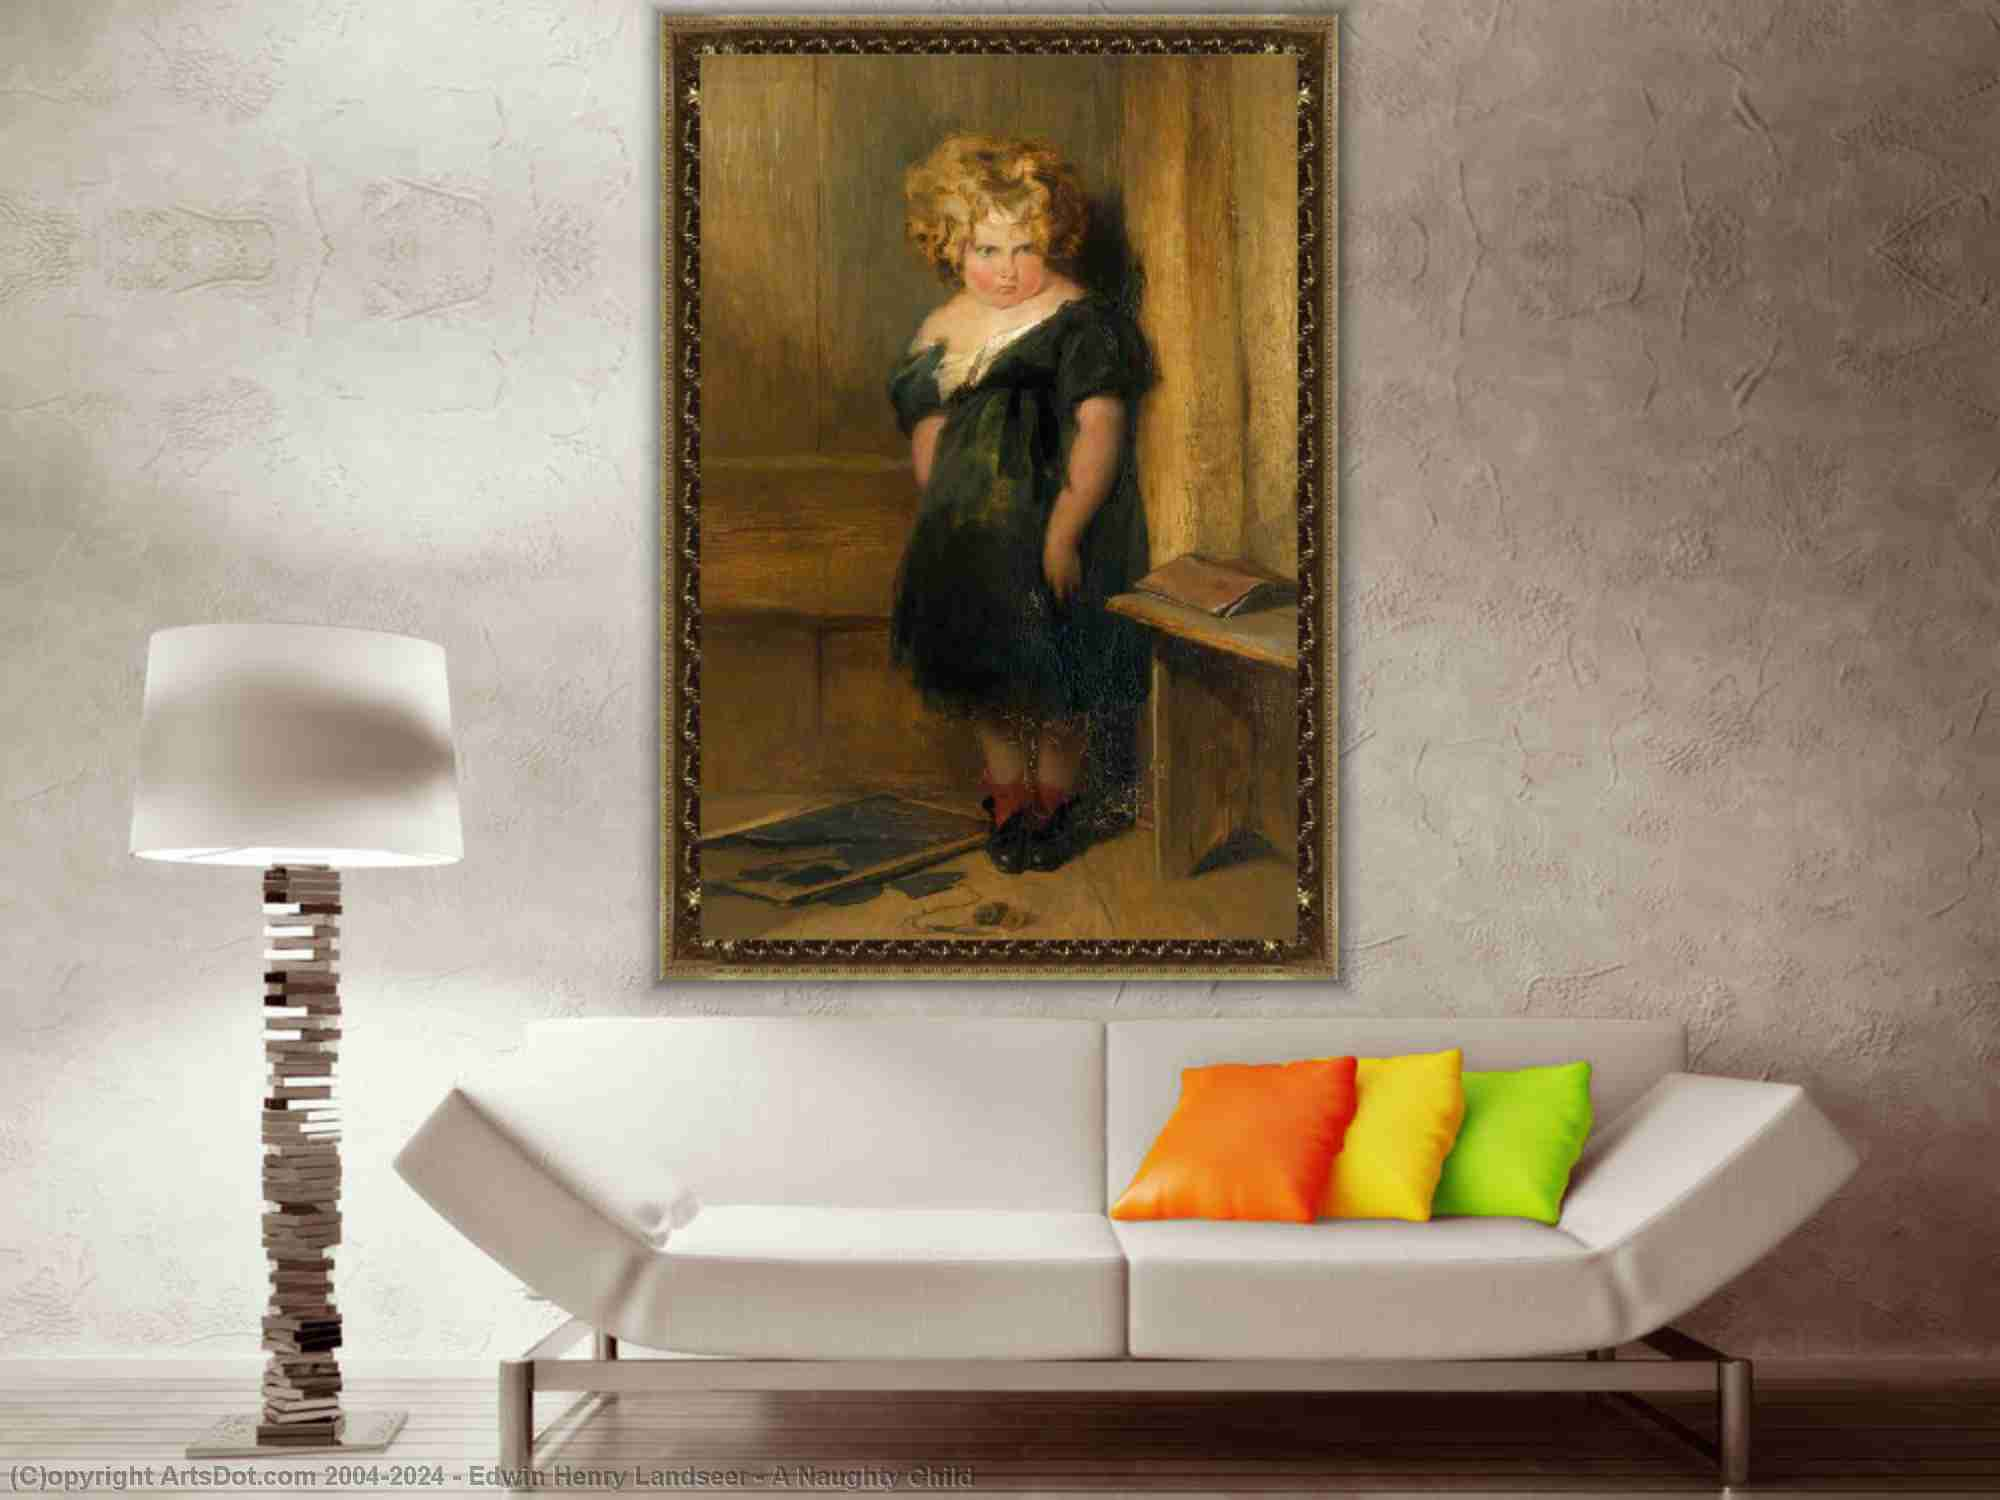 Edwin Henry Landseer - um impertinente criança